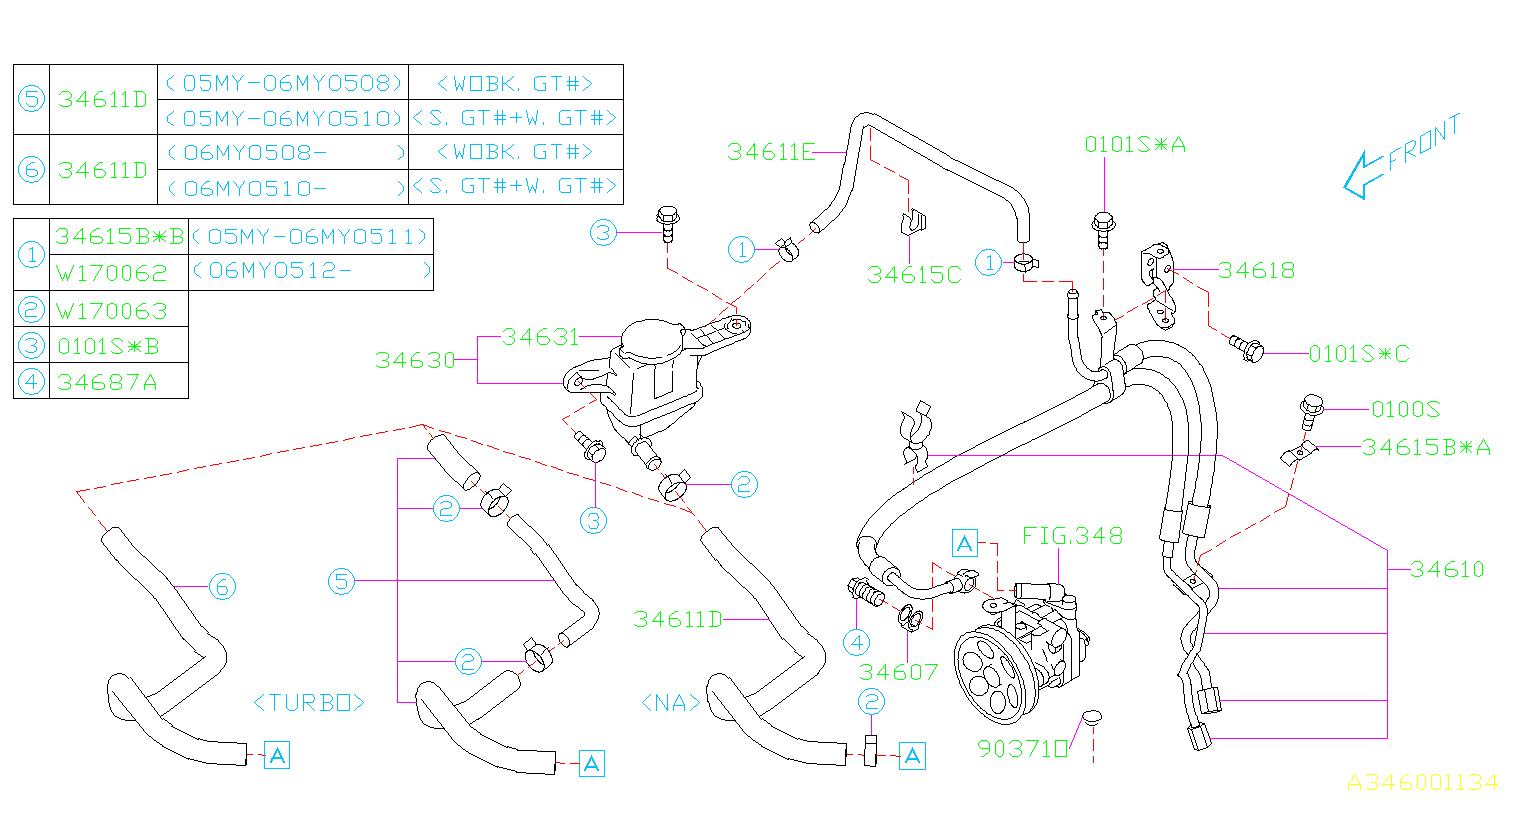 Subaru Legacy Stereo Wiring Diagram Furthermore Subaru Legacy Wiring